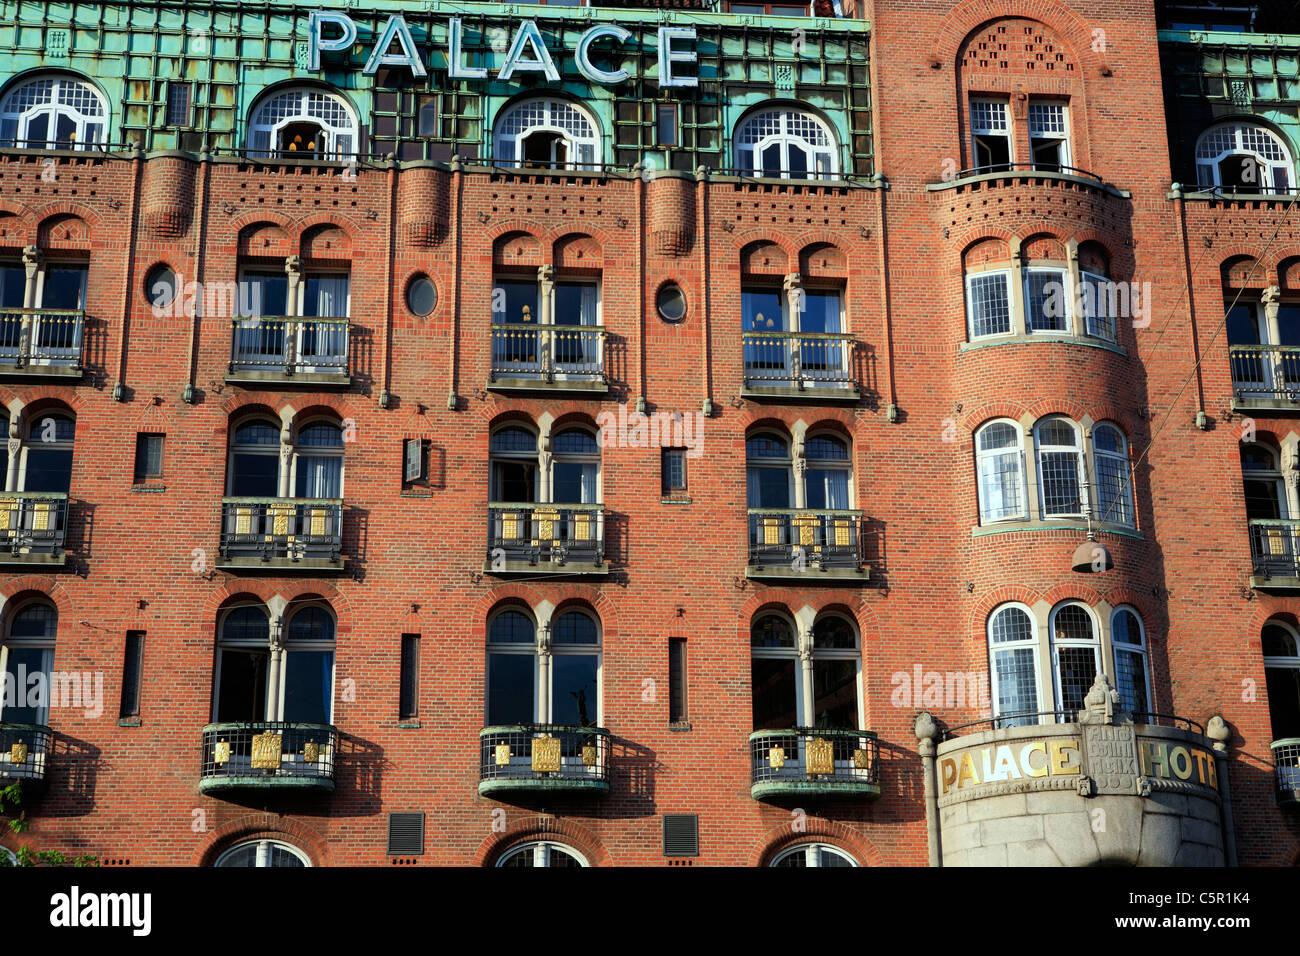 Palace Hotel (1906-1910, architect Anton Rosen), Copenhagen, Denmark - Stock Image